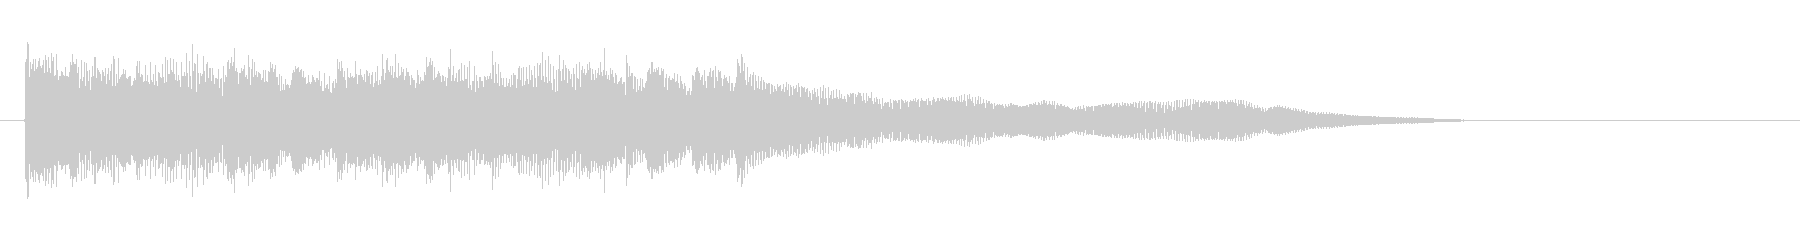 Refreshing jingle of glitter piano ③'s unreproduced waveform